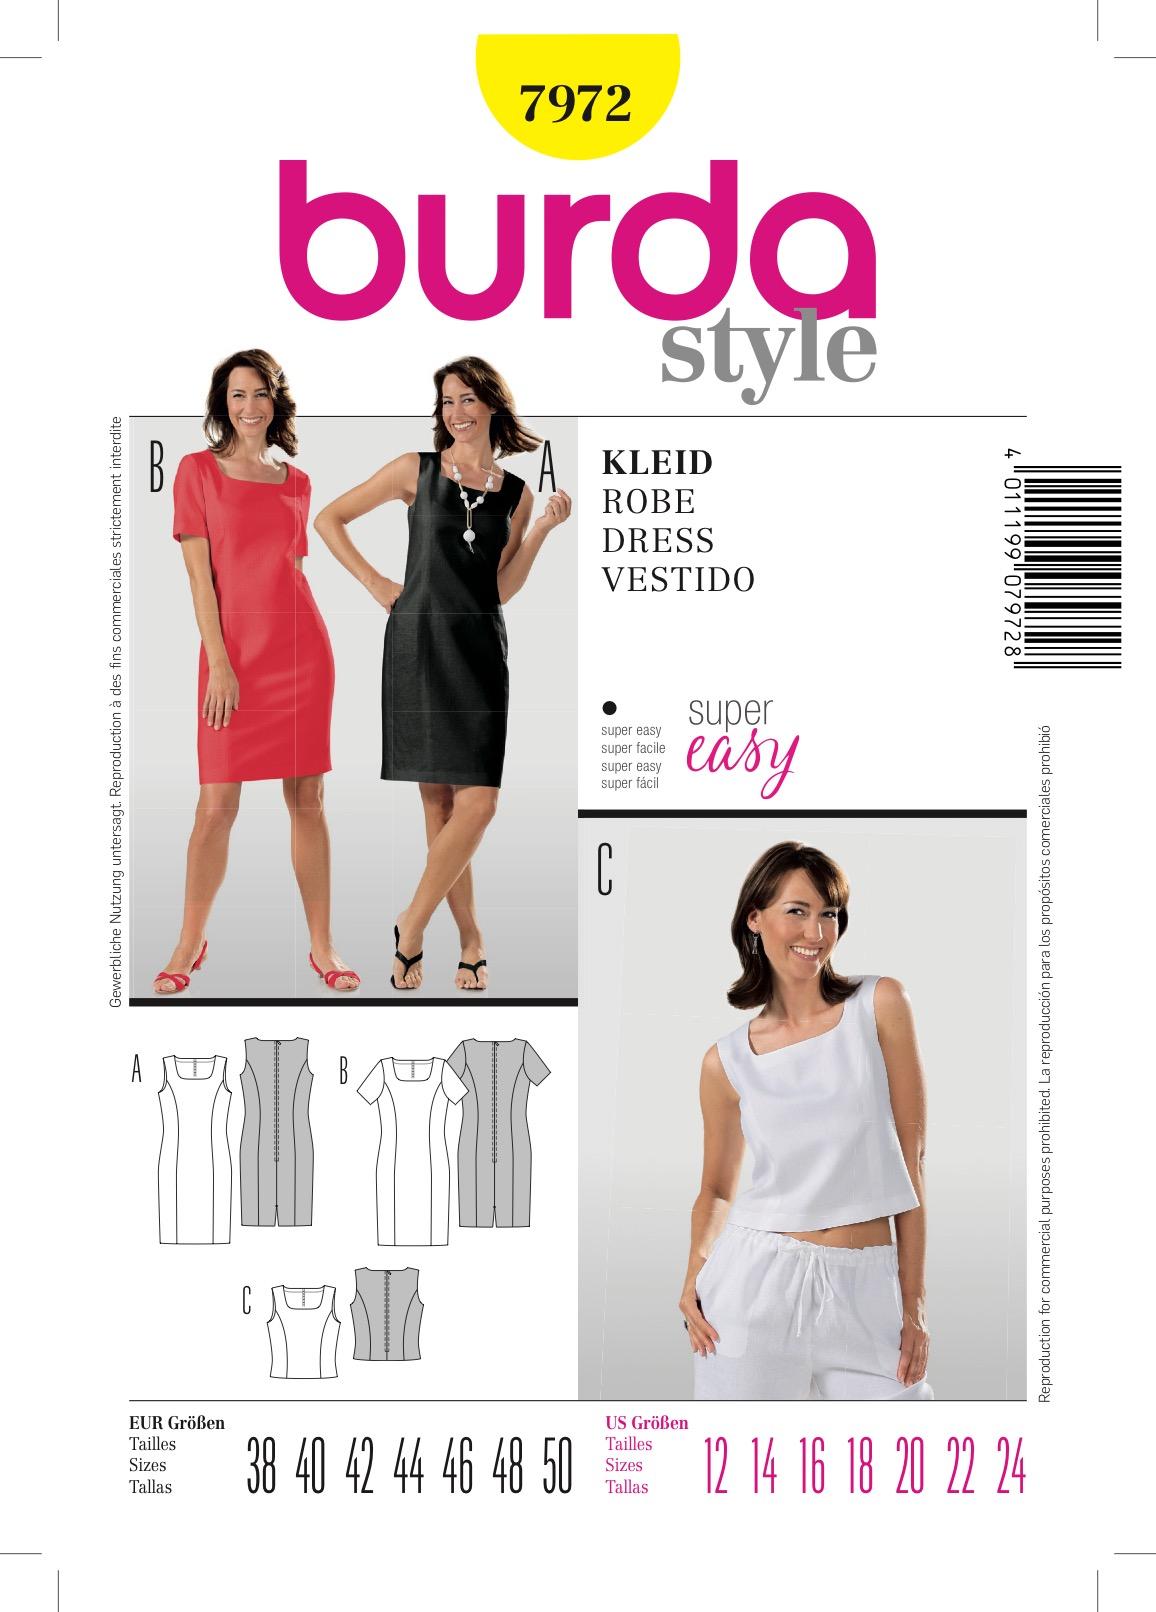 Burda 7972 Schnittmuster Kleid & Top (Damen, Gr. 38 - 50) Level 1 super easy